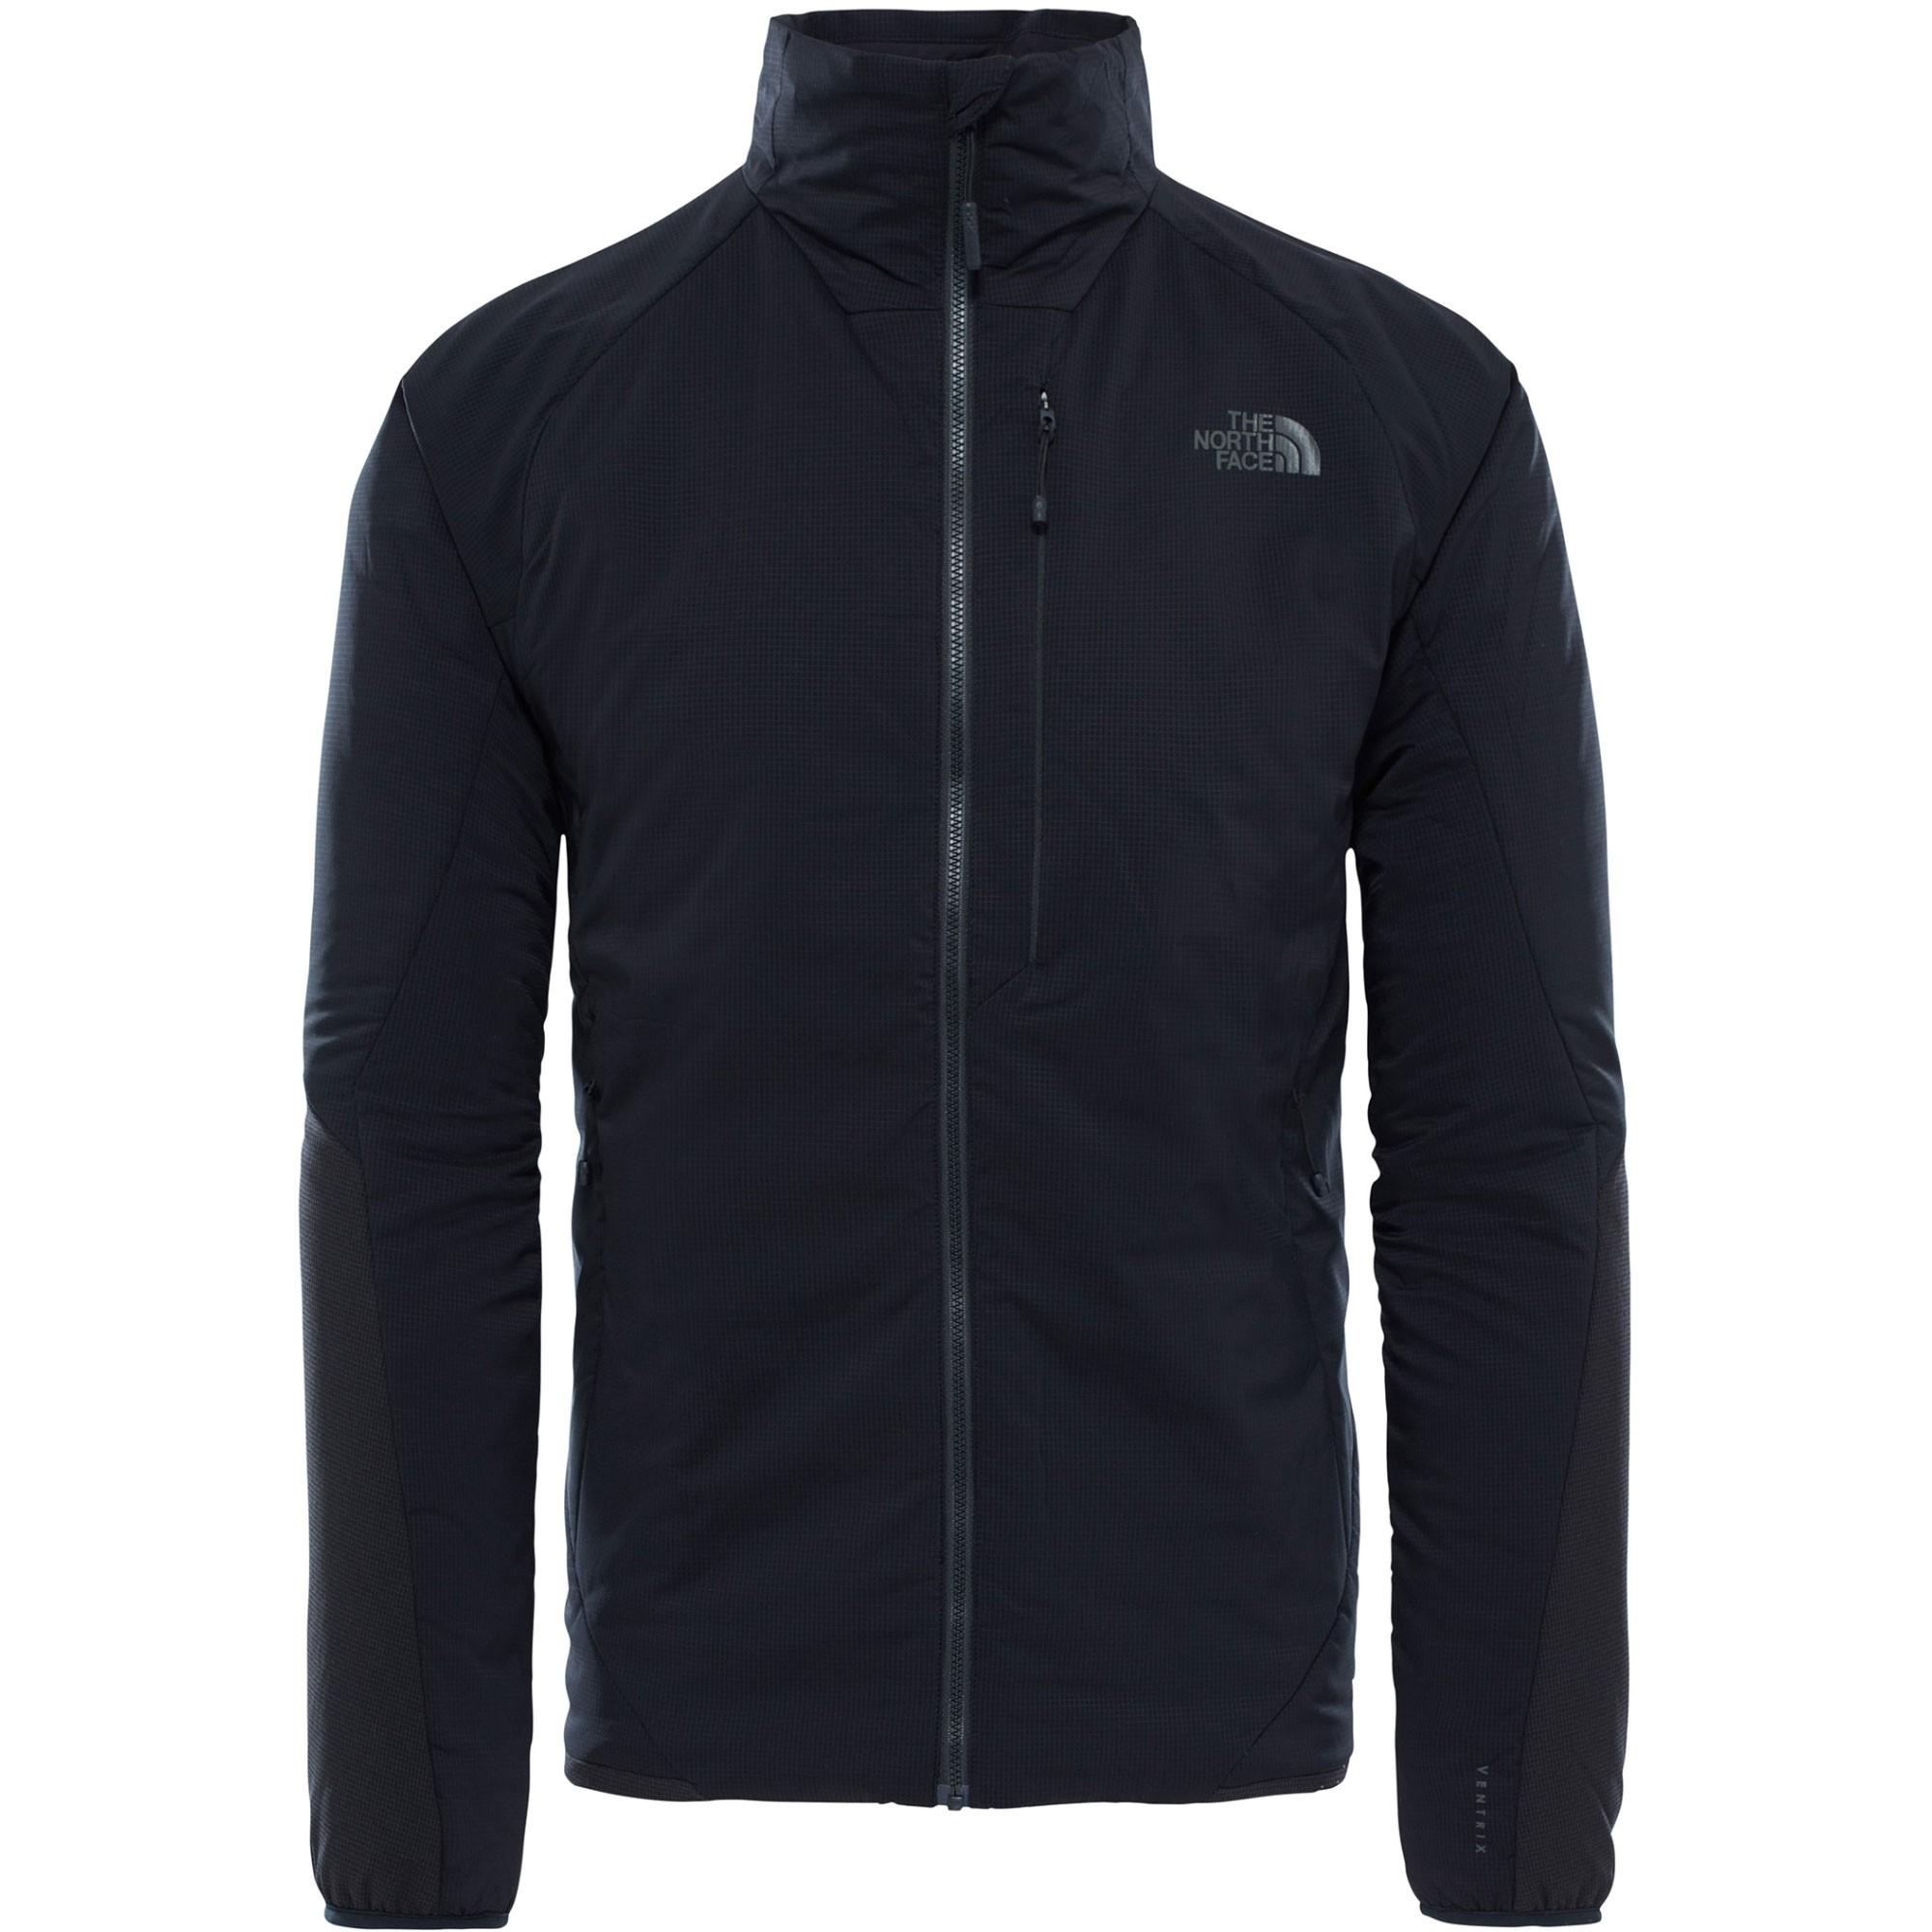 TNF Men's Ventrix Jacket - TNF Black